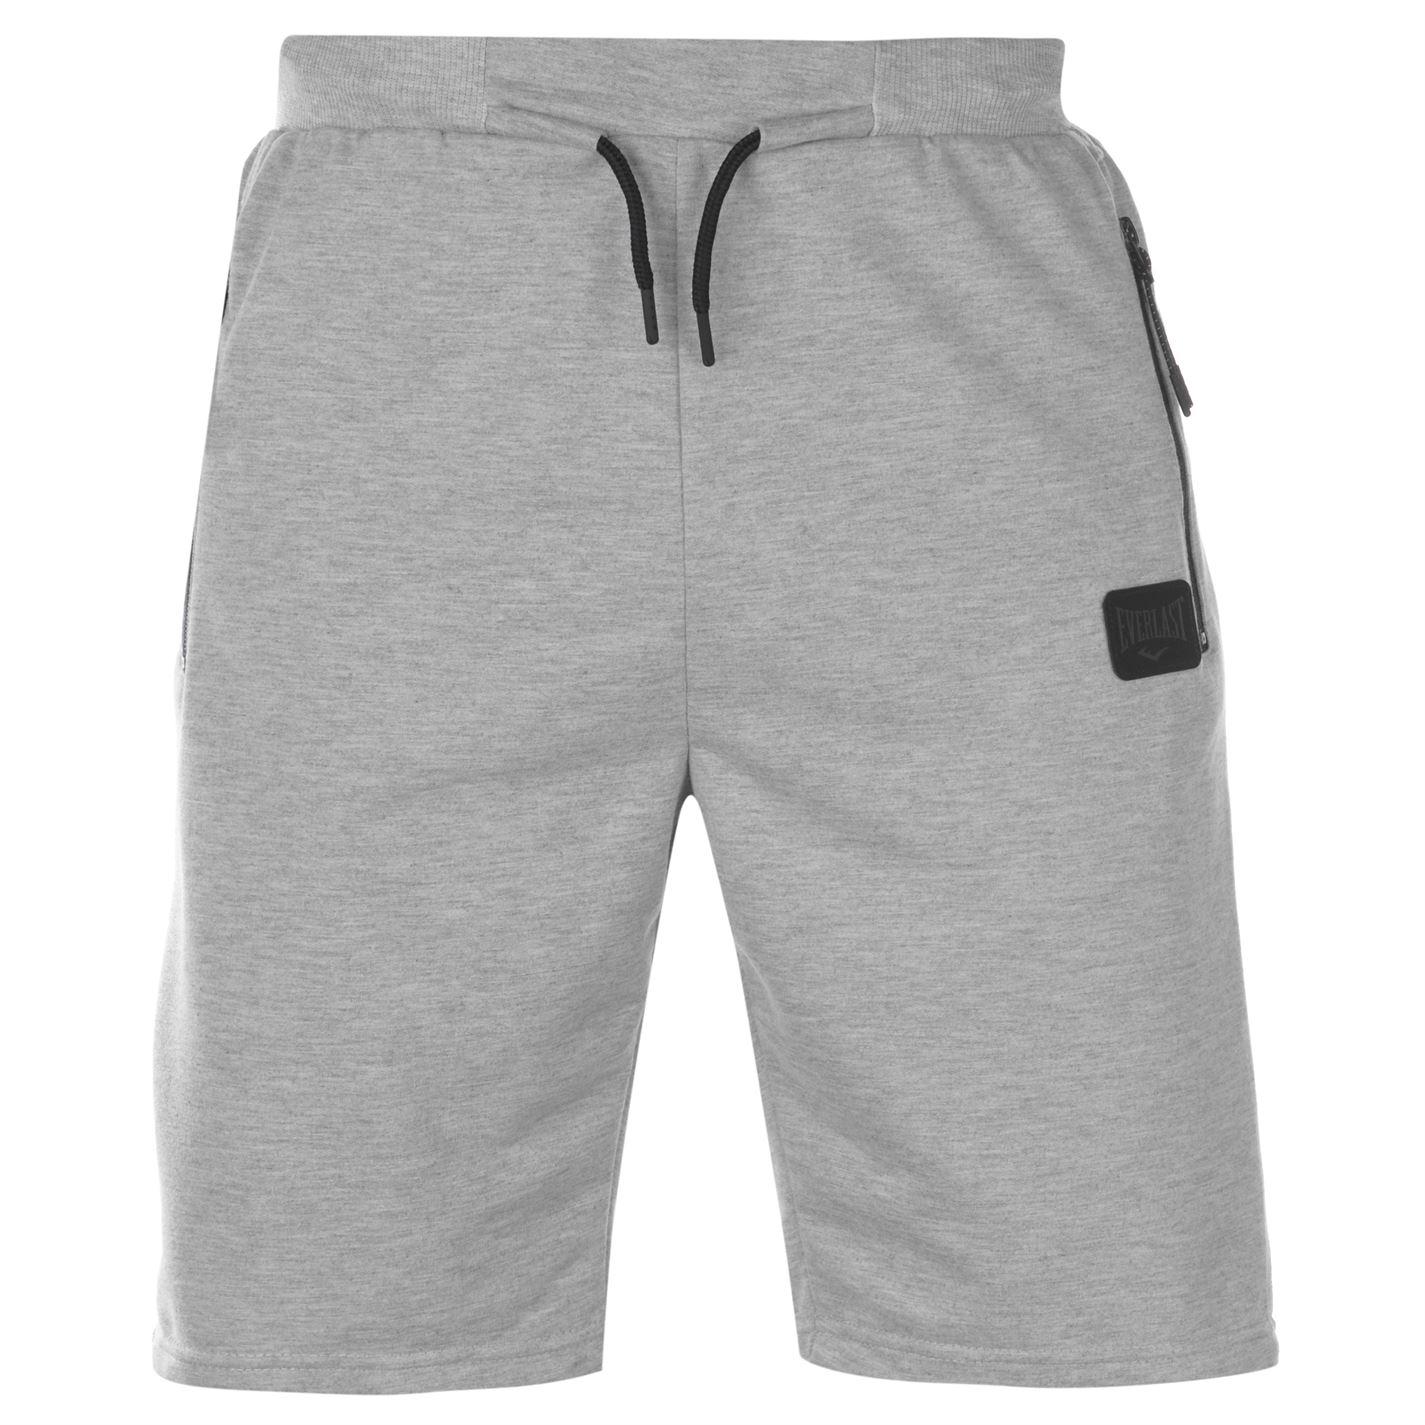 Everlast Premier Shorts Mens